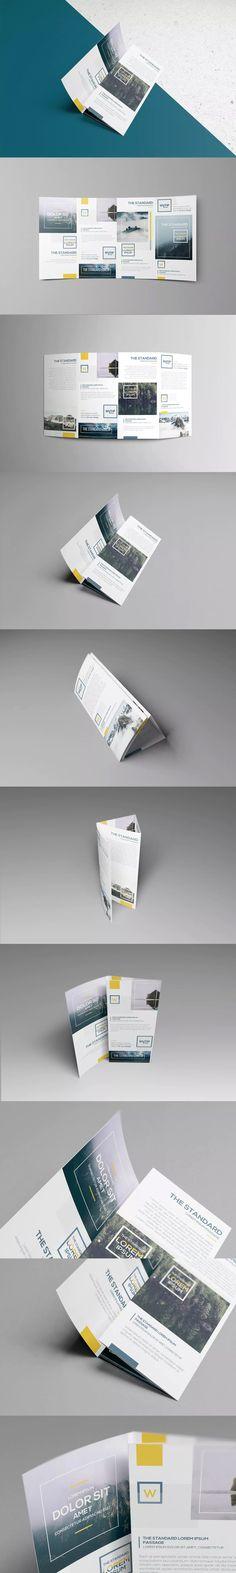 Four Panel Roll Fold Brochure Mockups